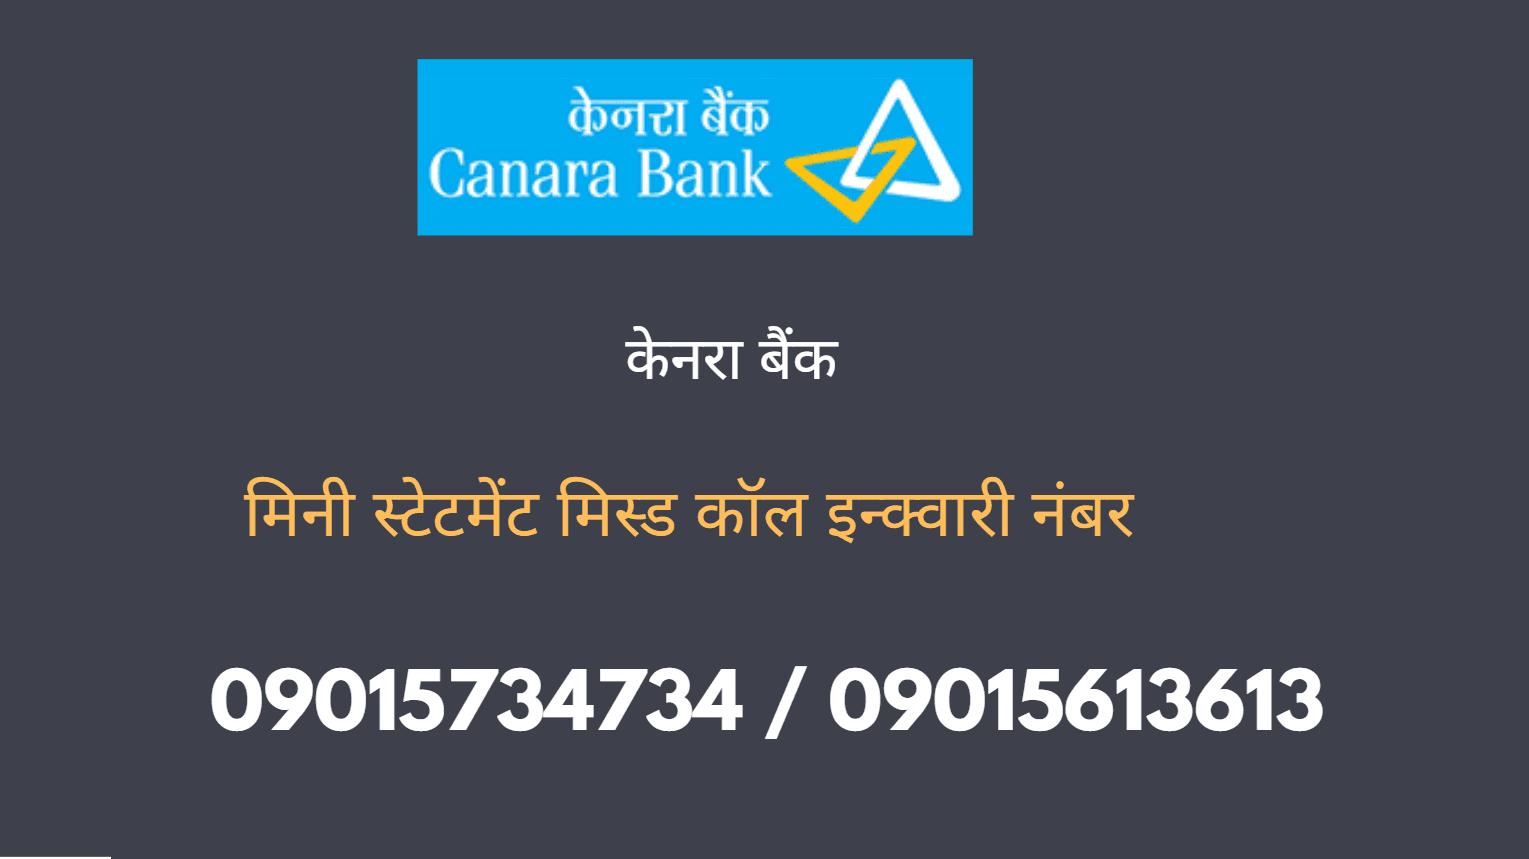 canara bank mini statement number